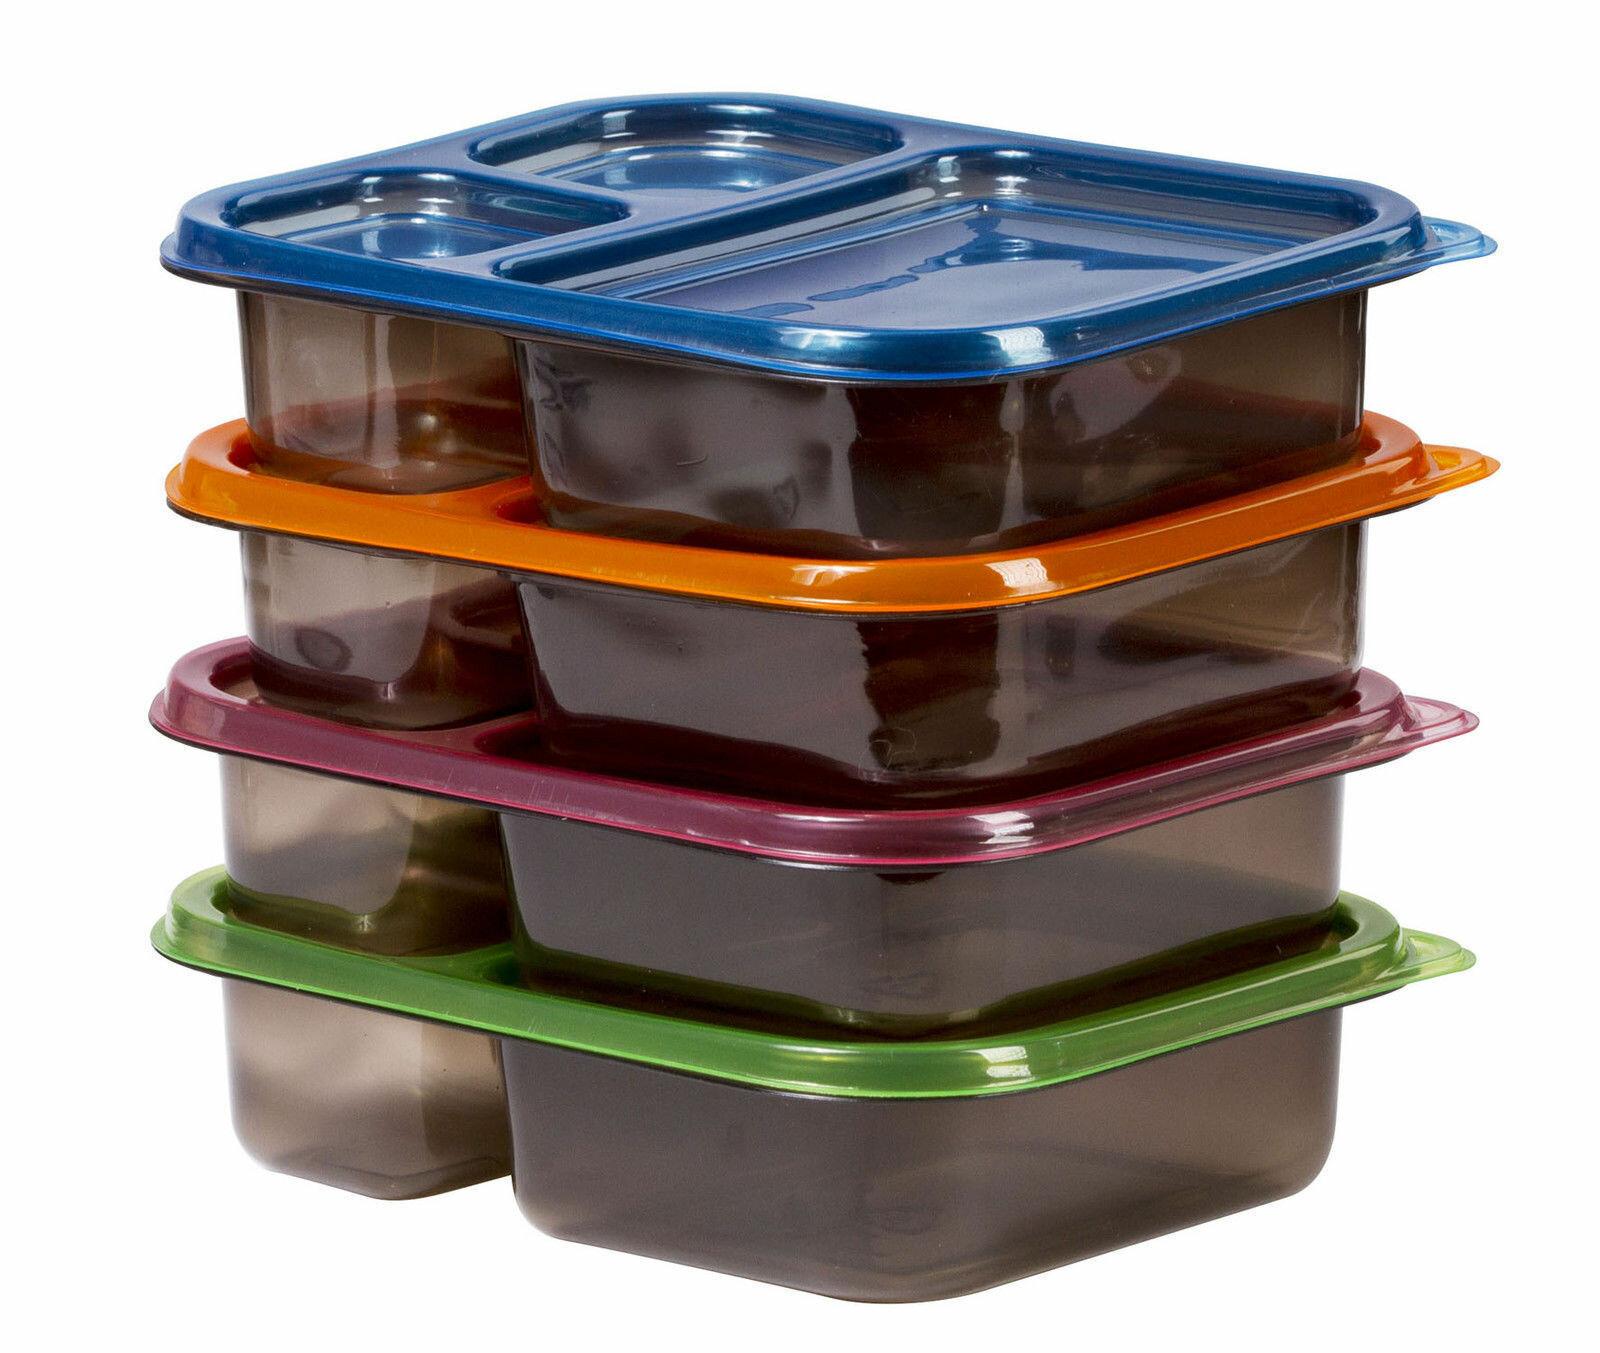 Rebrilliant Meal Prep 4 Container Food Storage Set Reviews Wayfair